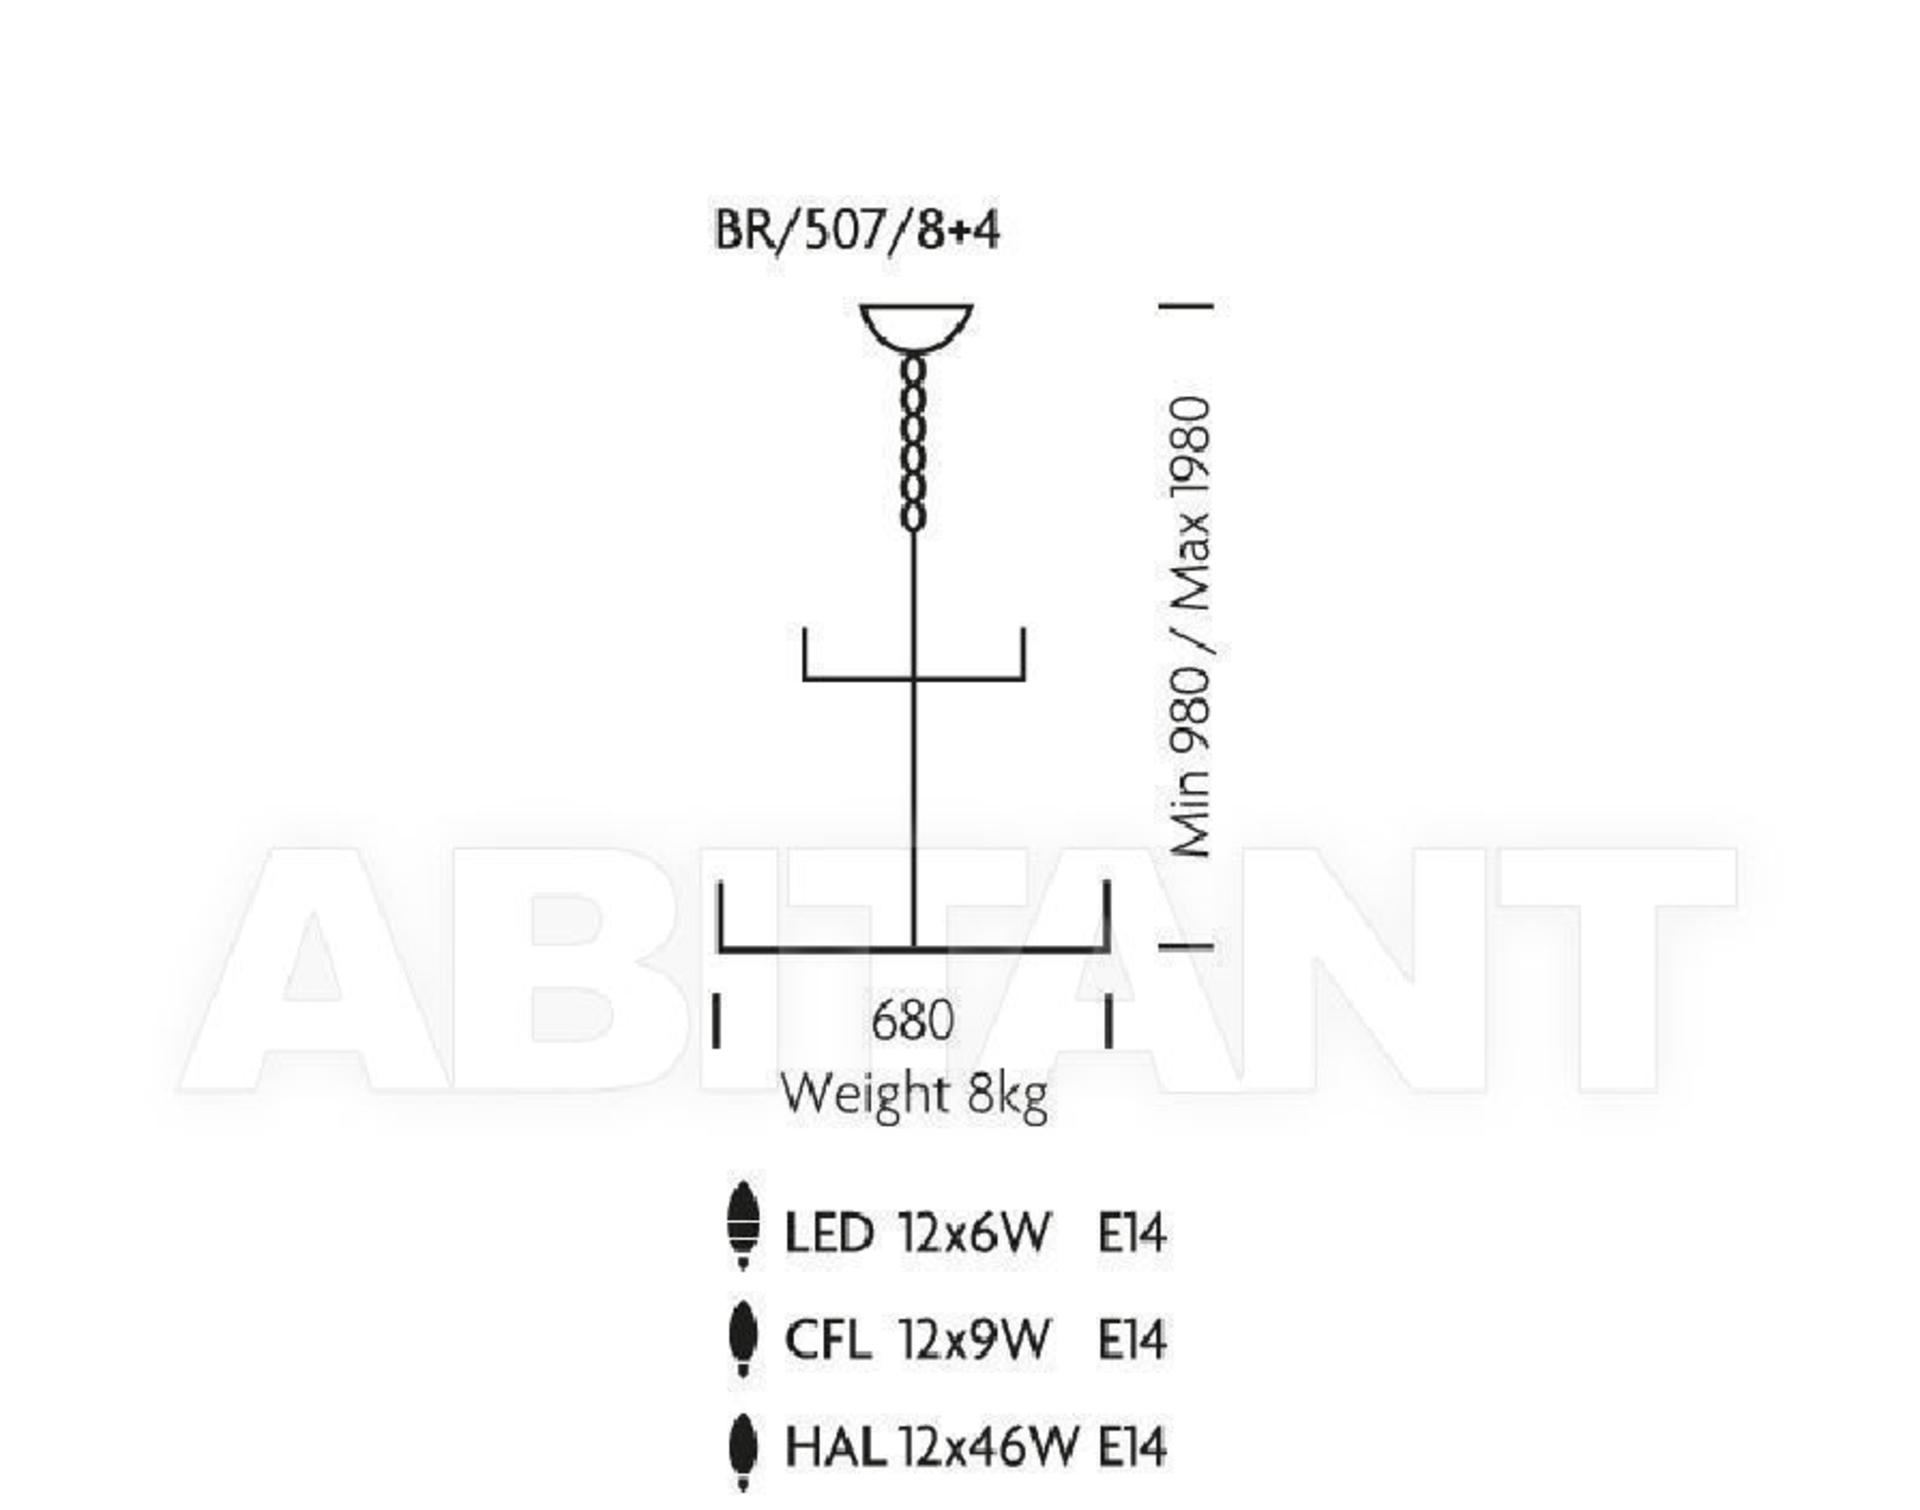 Lot 8041 - 1 x New In Box Chelsom Ballroom Сhandelier BR/507/8+4 - CL001 - REF288/A31 - Location: Altrincham